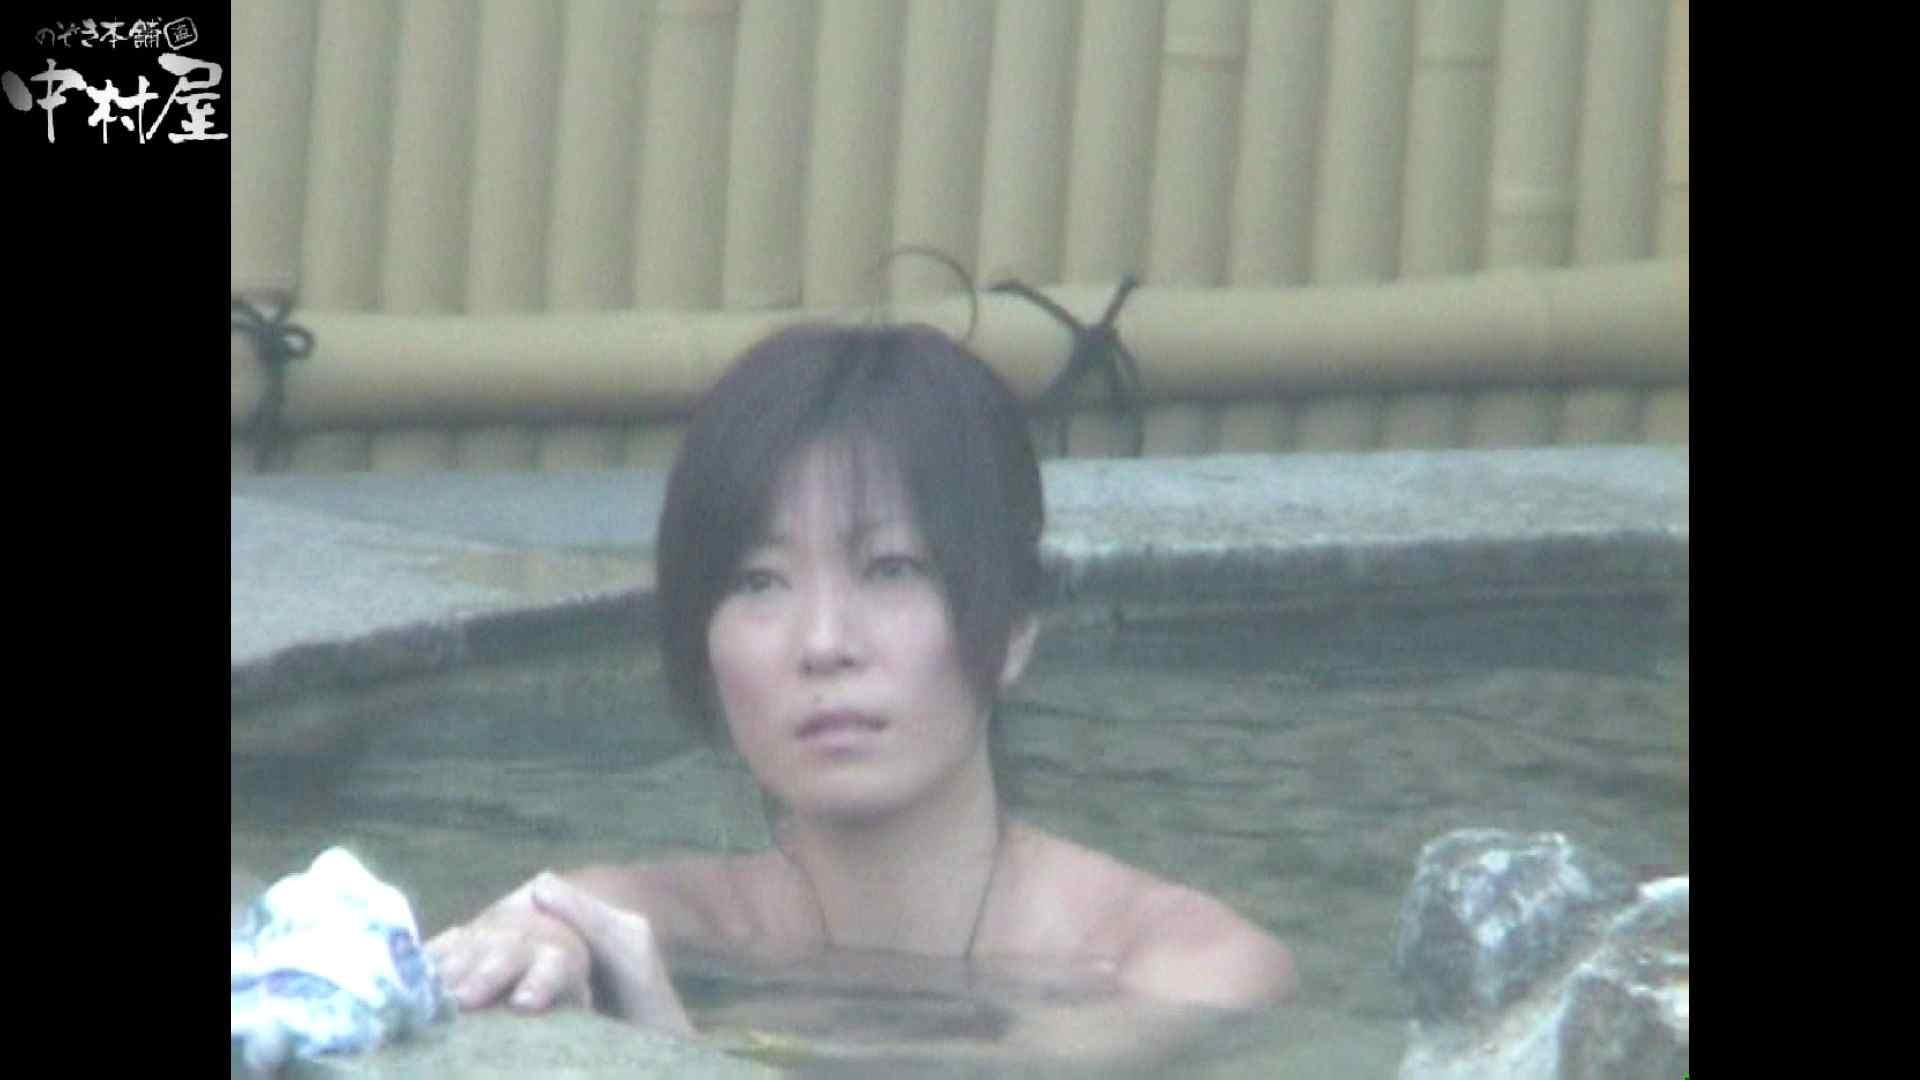 Aquaな露天風呂Vol.972 露天   OLセックス  80画像 64